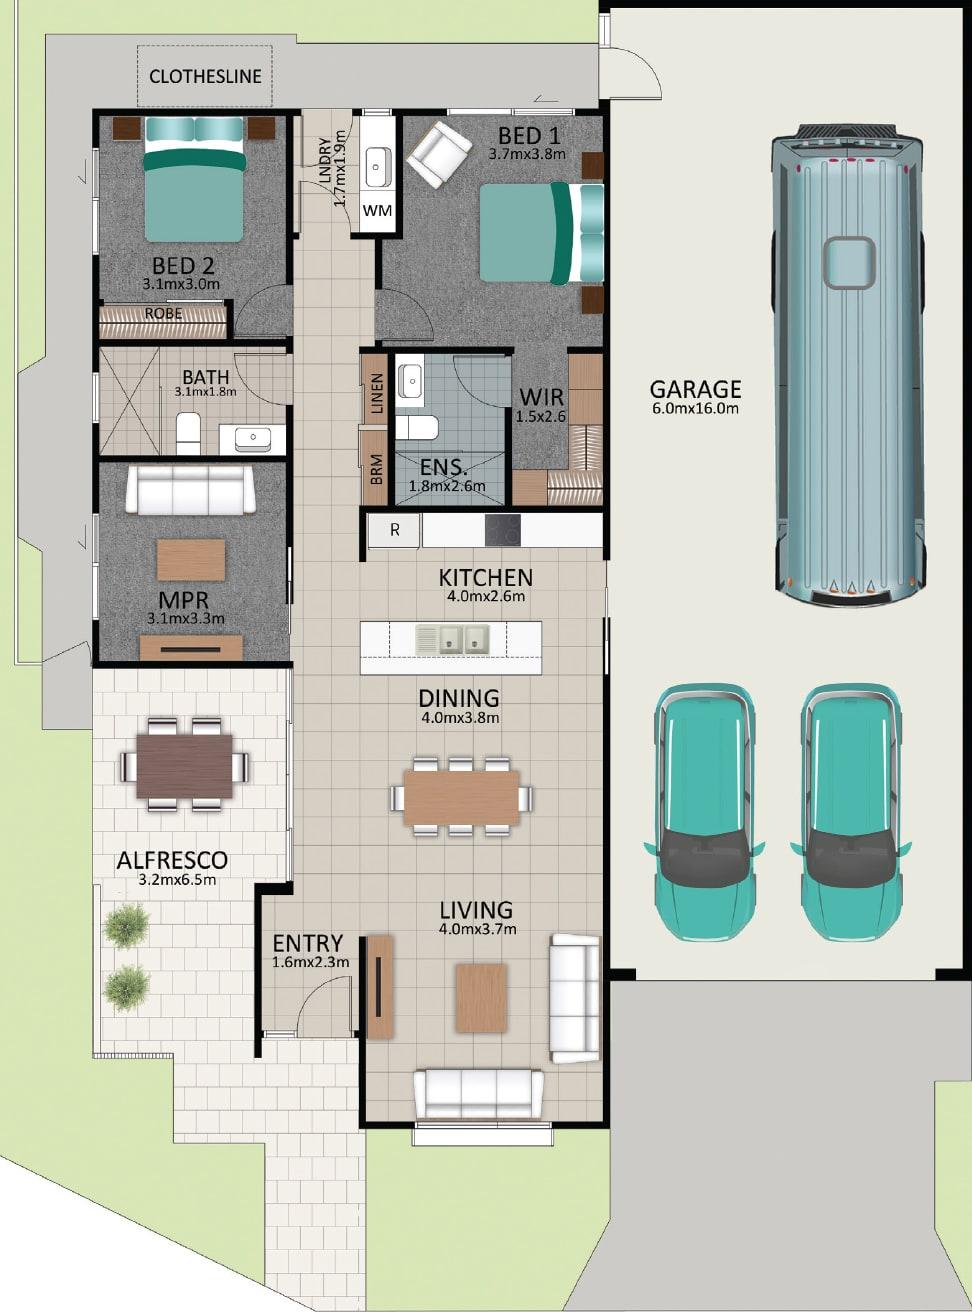 LAT25 Floorplan GAL LOT 233 FEB2021 V1 - Lot 233